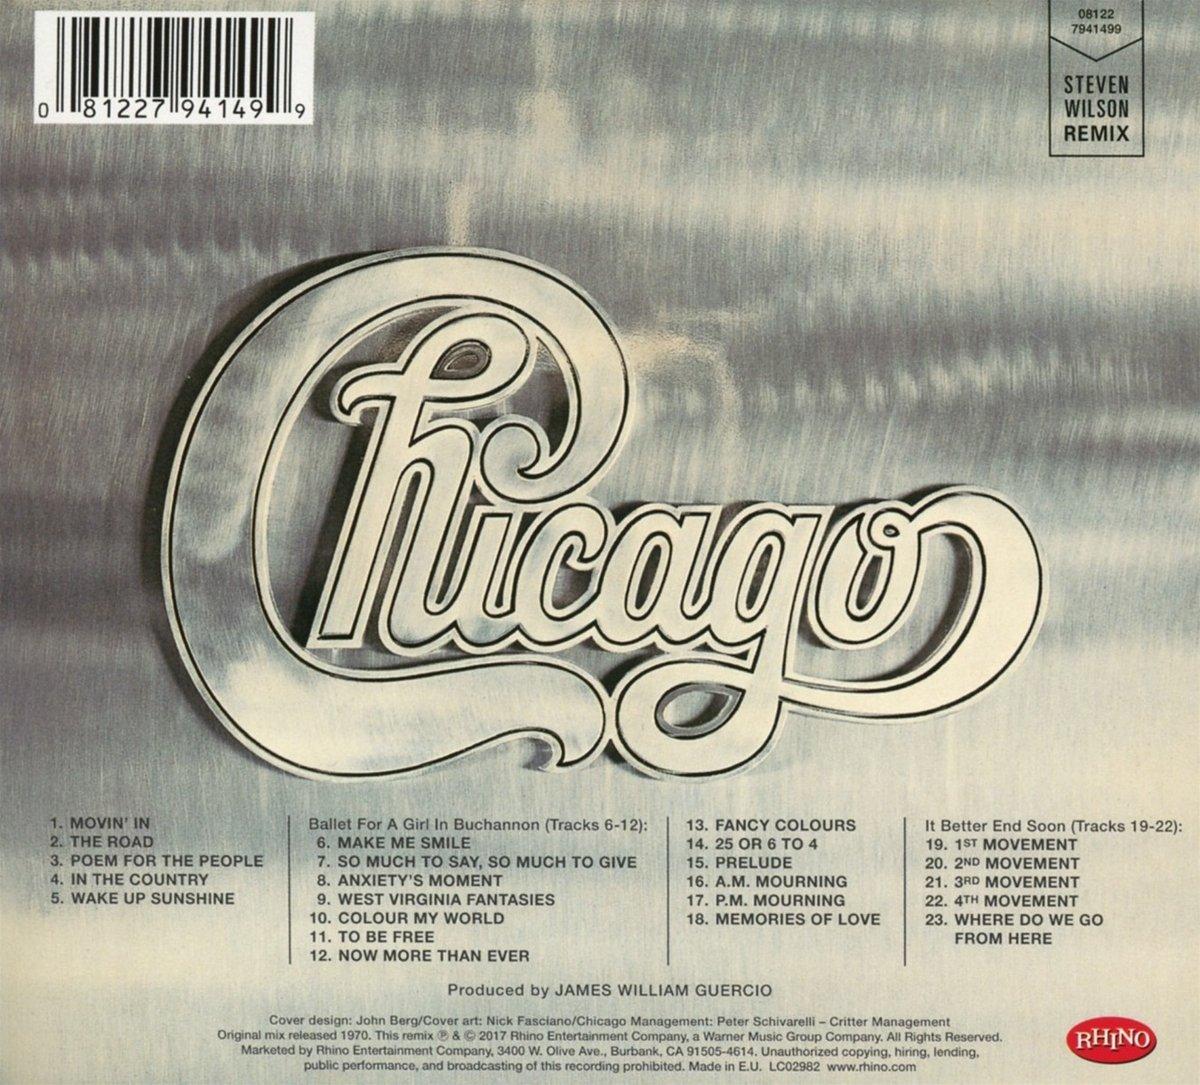 17043723e8d Chicago II (Steven Wilson Remix): Amazon.co.uk: Music